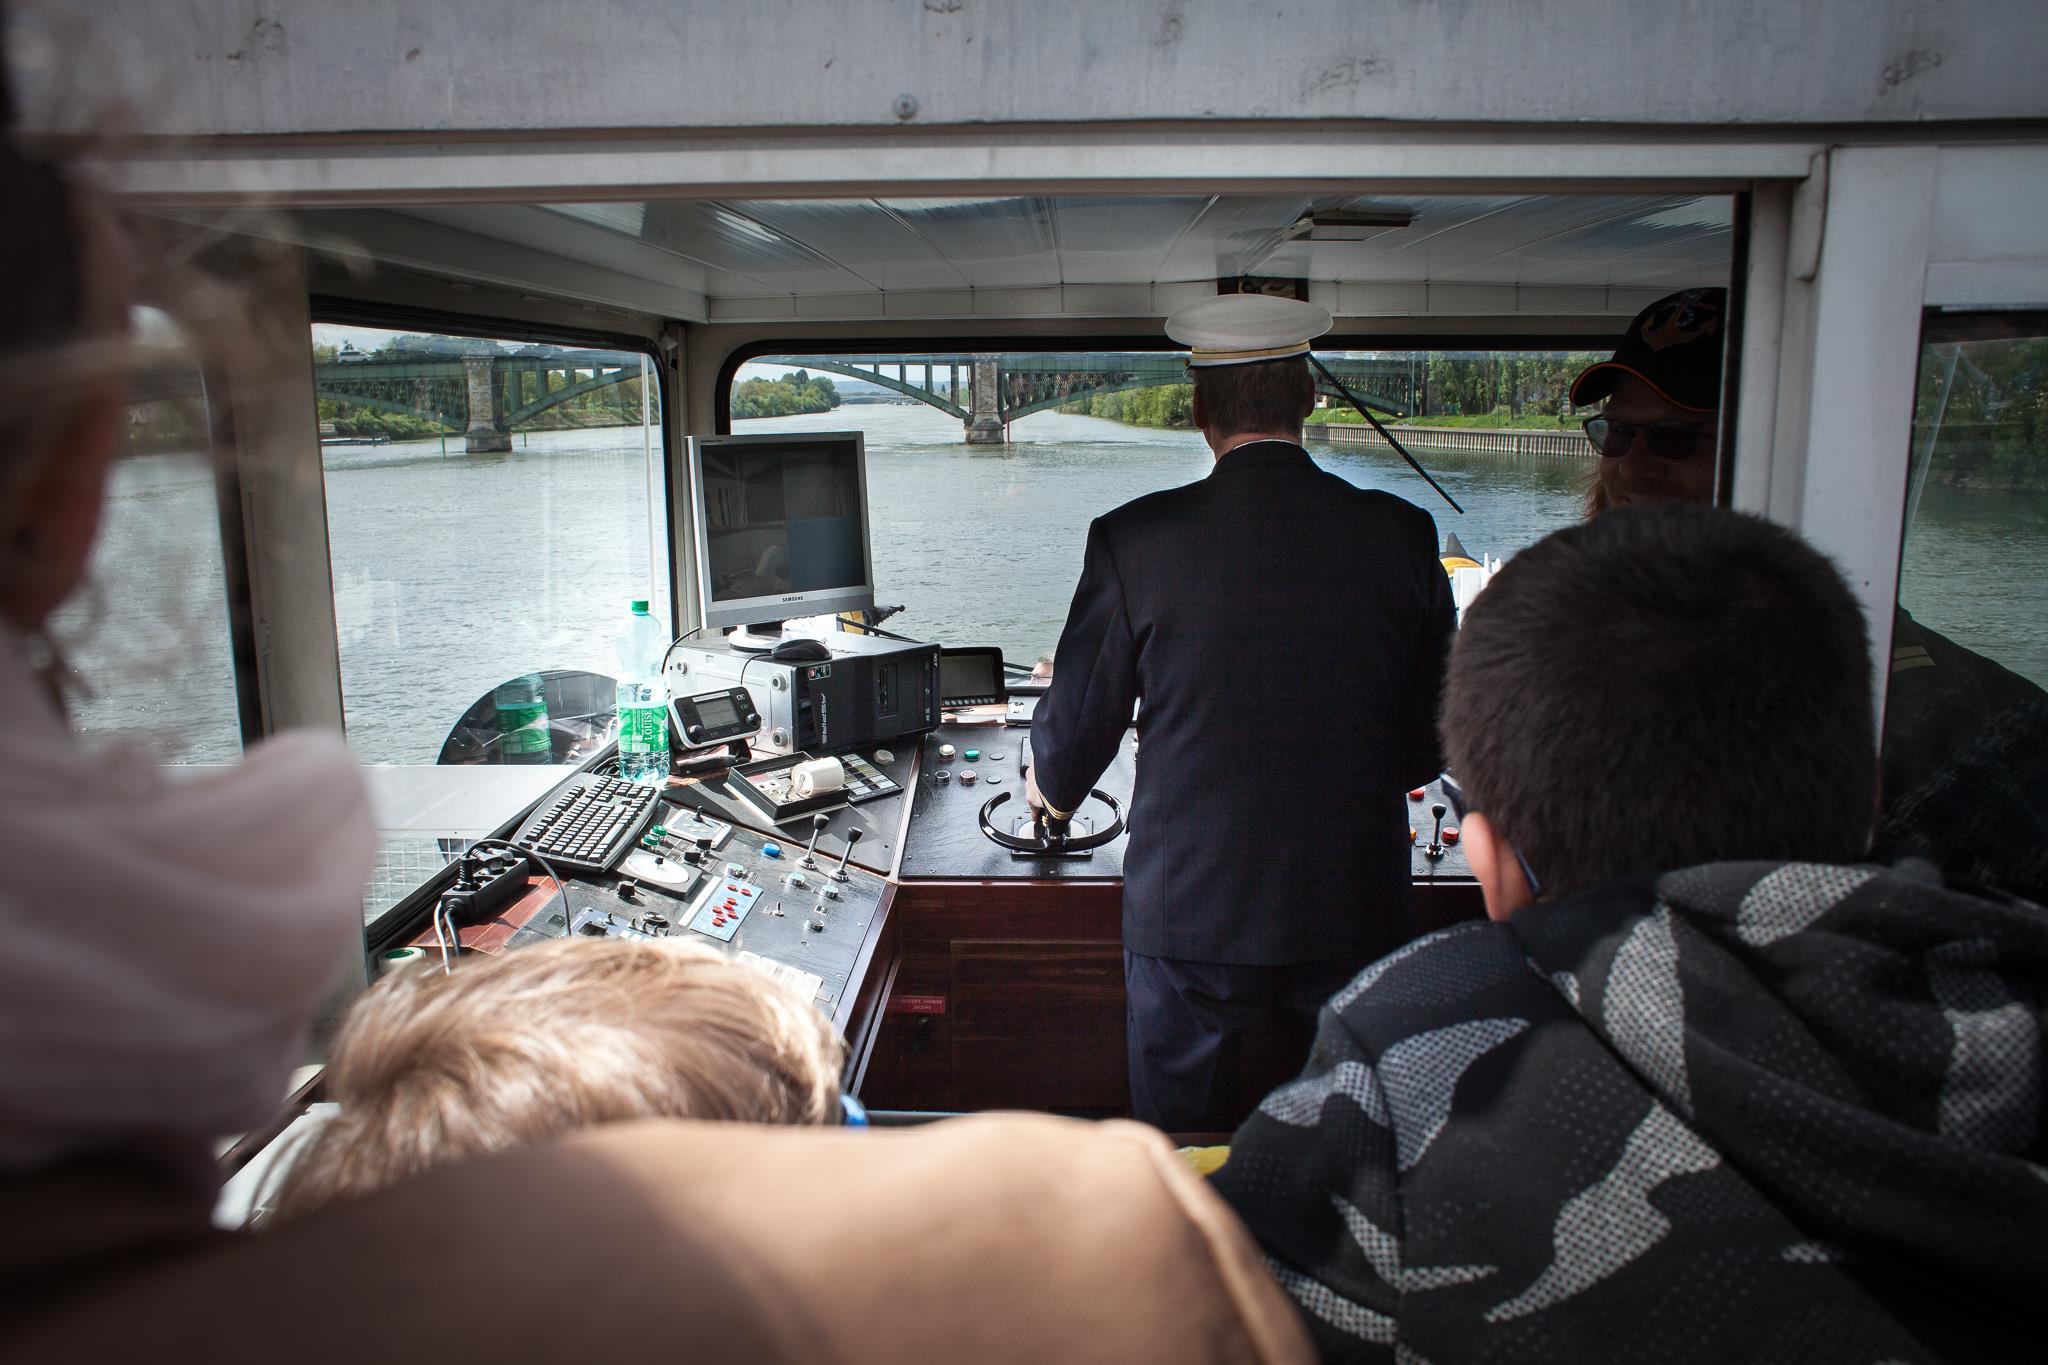 Balade en bateau a argenteuil